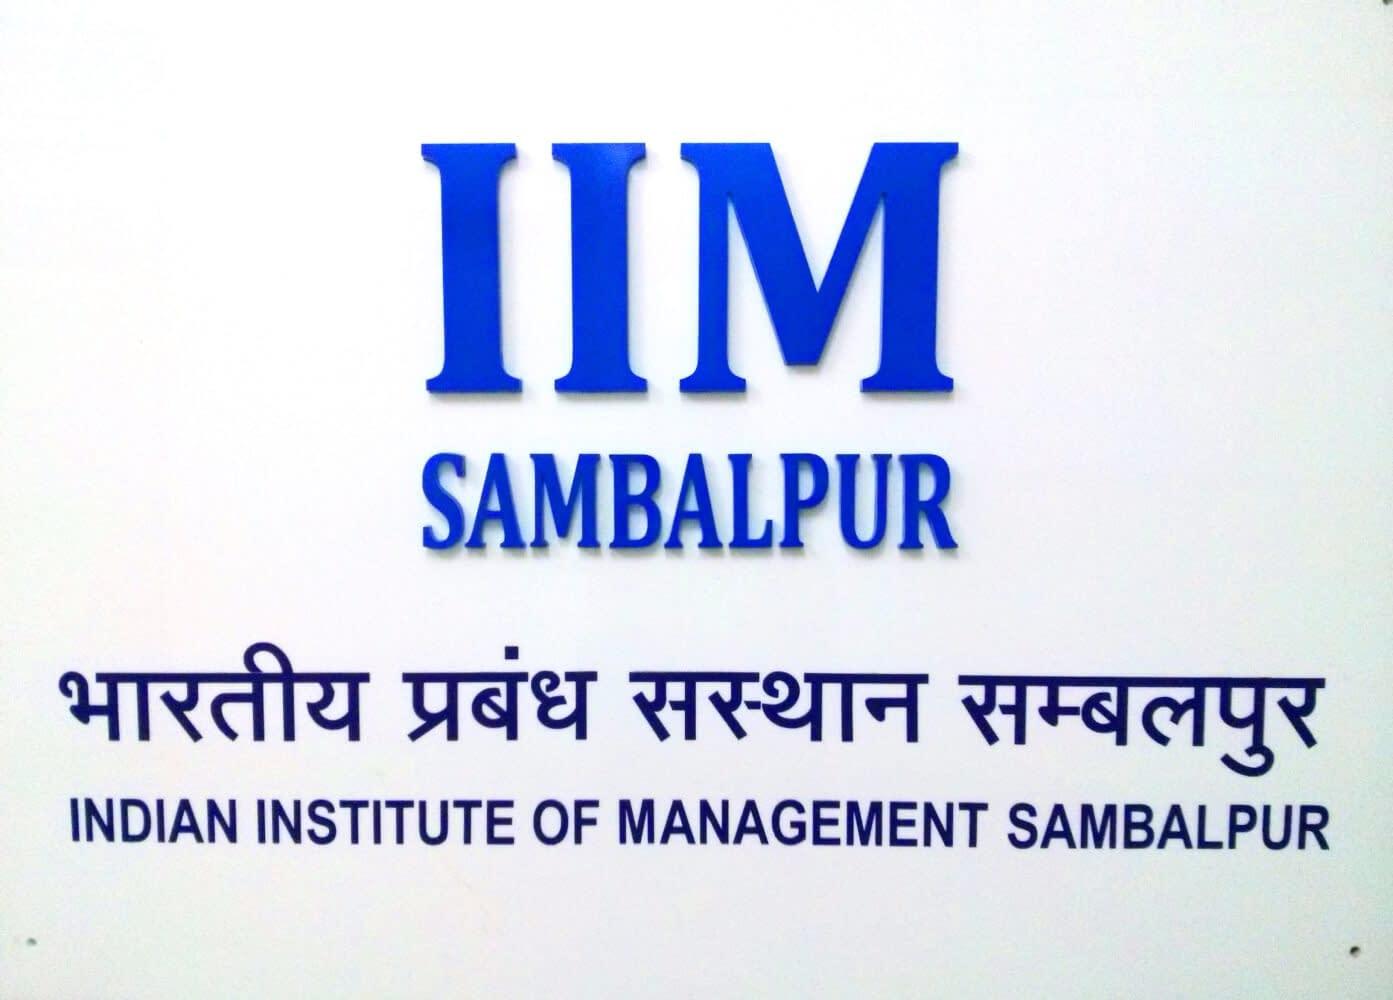 IIM Sambalpur - Social Media for Business - Course